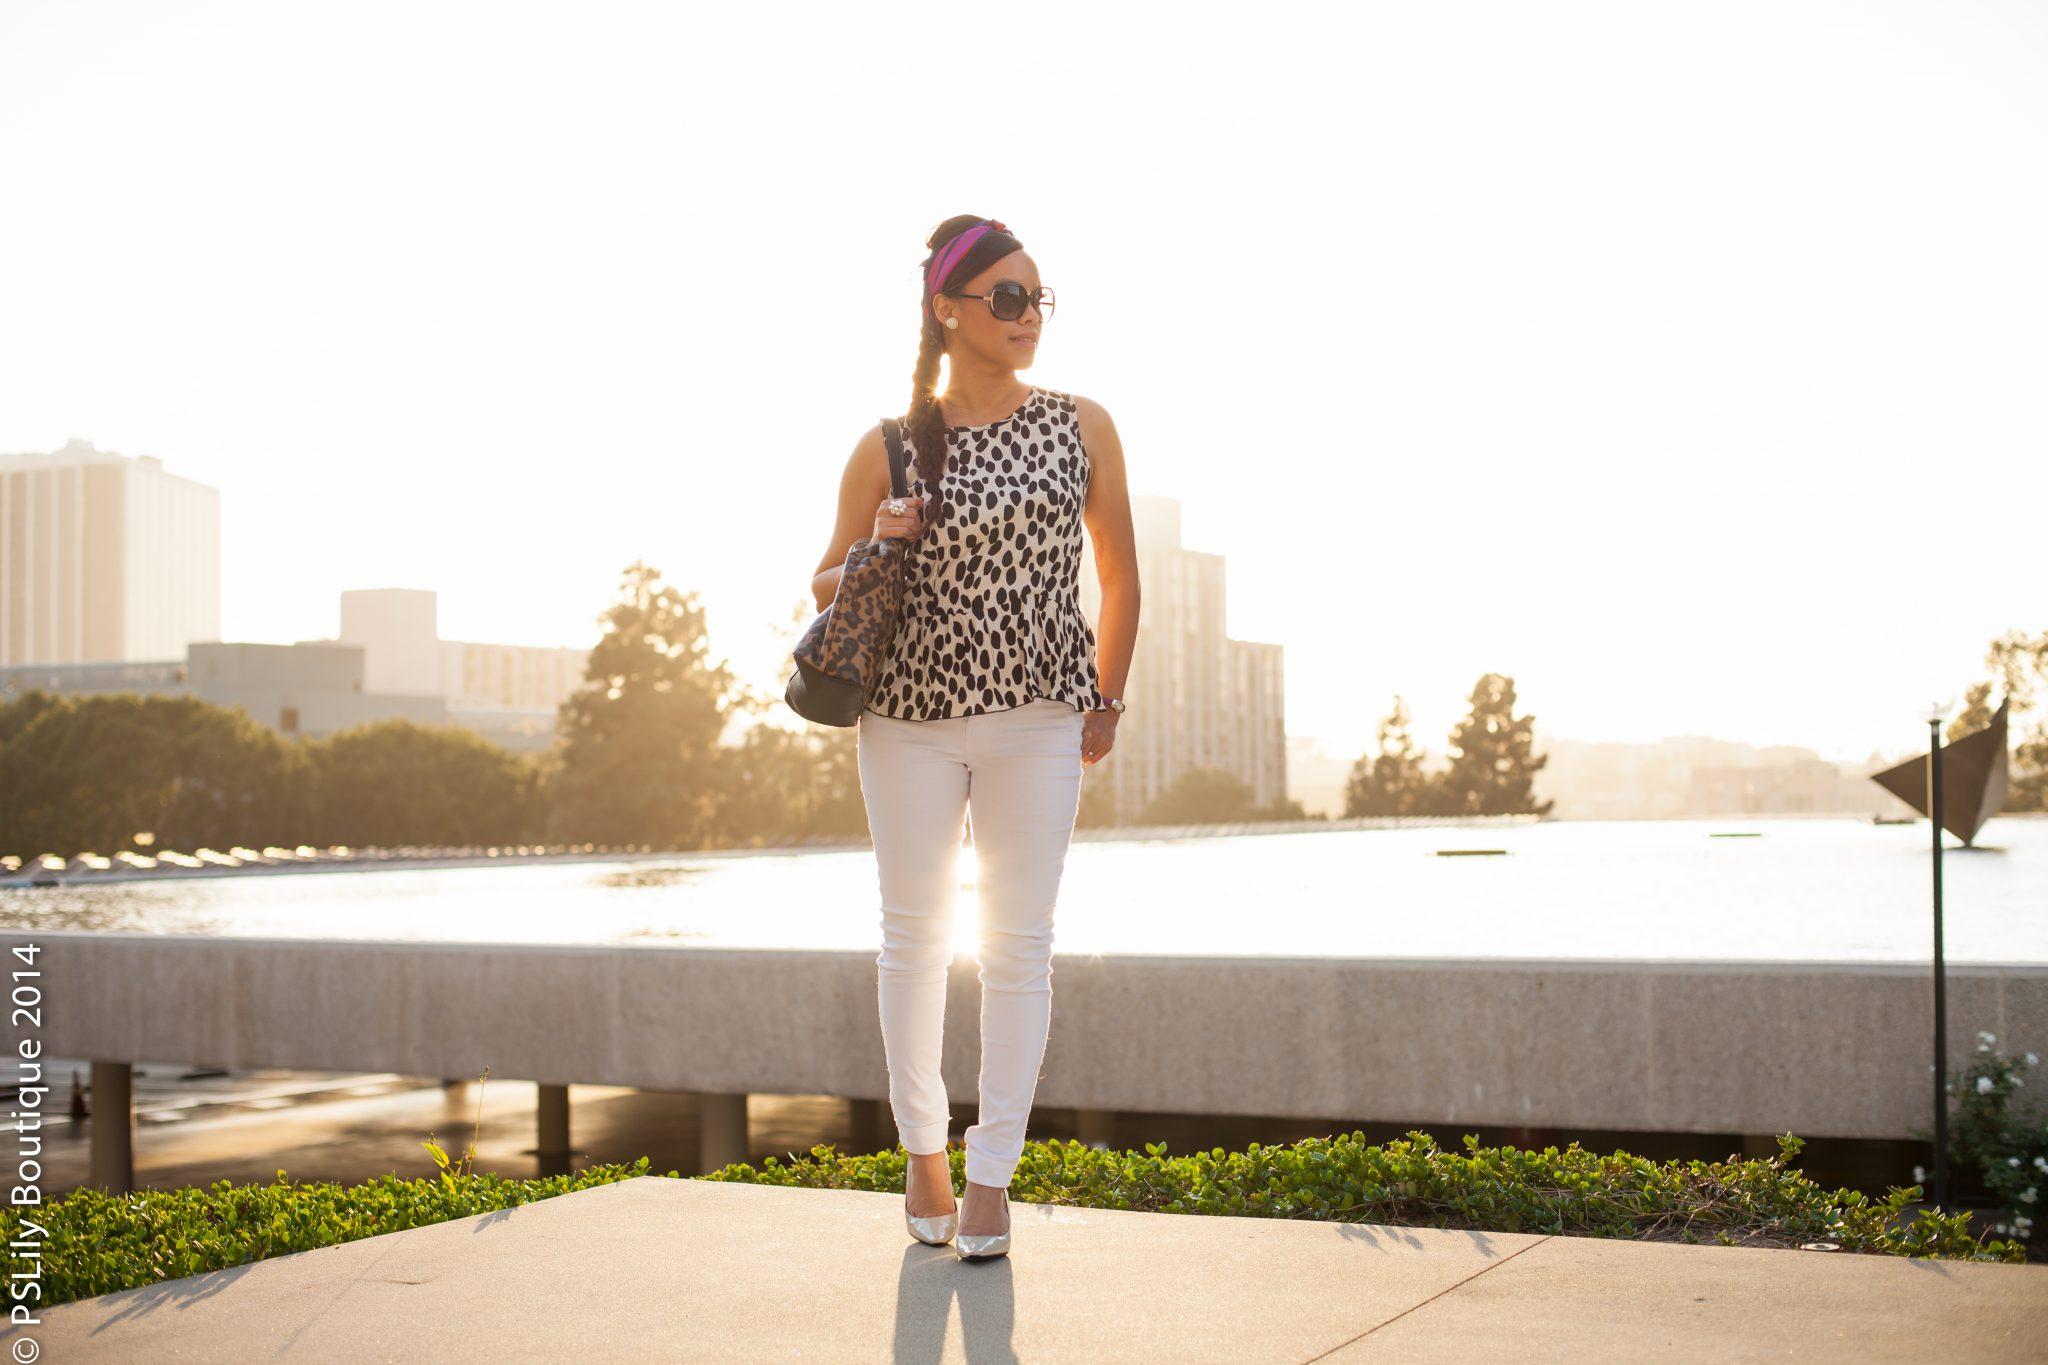 instagram-pslilyboutique, LA fashion blogger, best fashion blogger, white skinny jeans, h&m leopard print top, calvin klein pumps, street fashion, spring outfit ideas